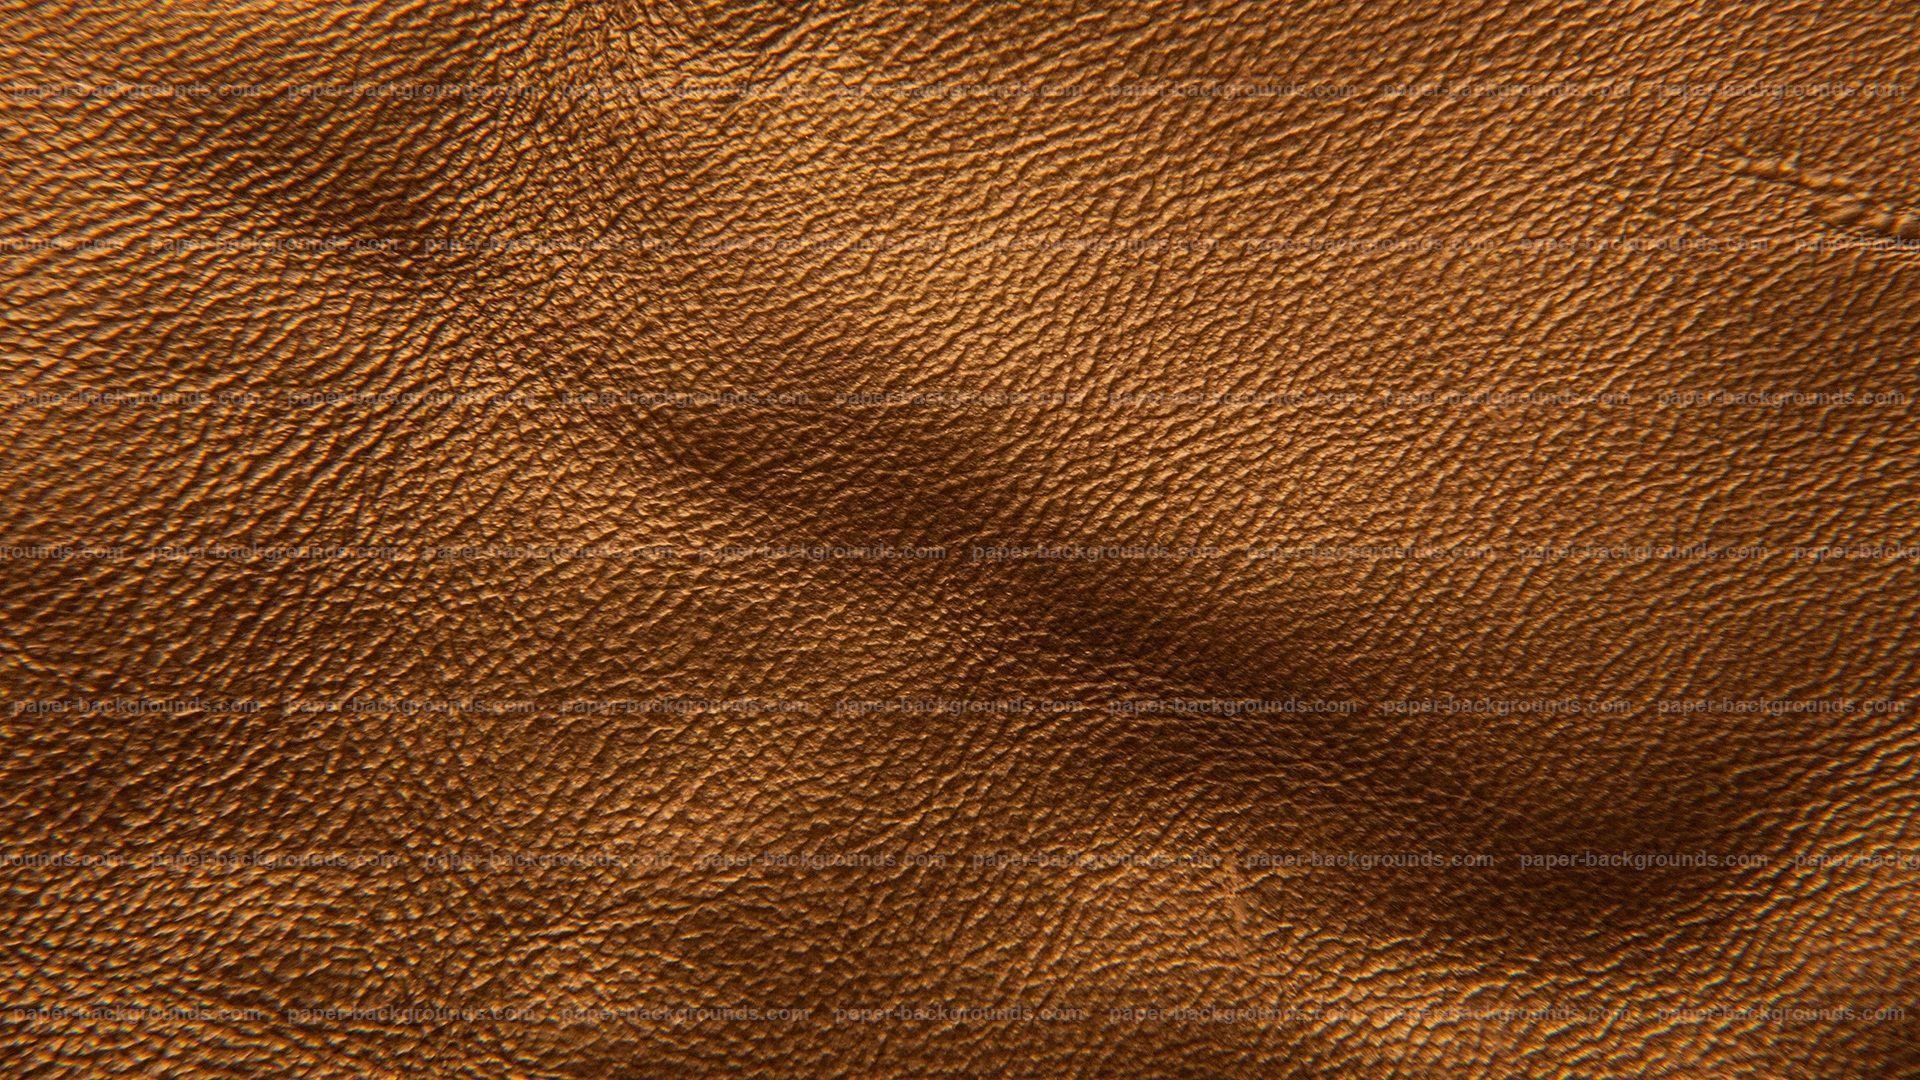 Best Leather Desktop Wallpapers - Top Free Best Leather Desktop